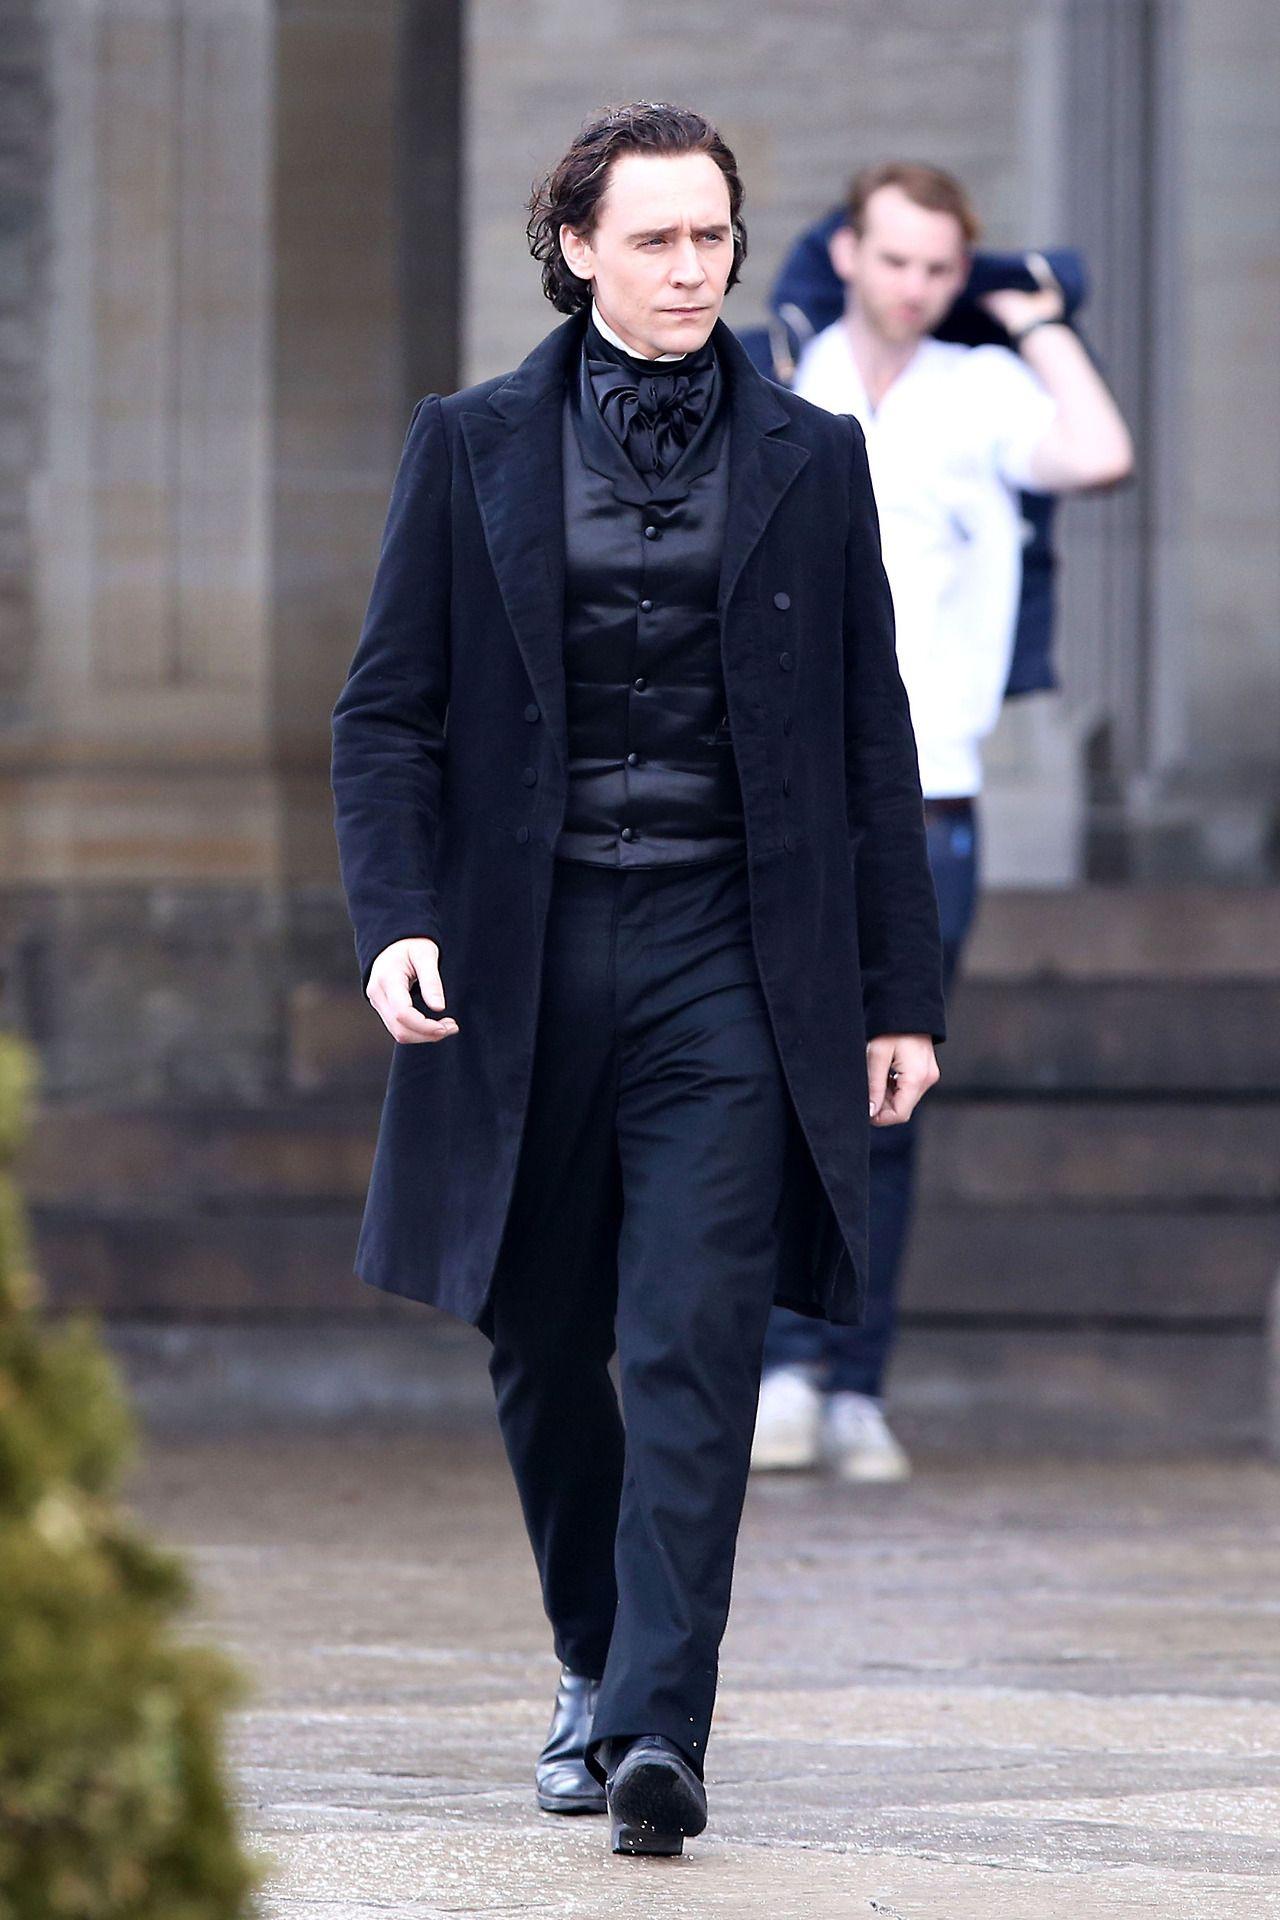 Tom Hiddleston gets prepped to film scenes for 'Crimson Peak' in Toronto on April 22, 2014 [HQ]. (http://torrilla.tumblr.com/post/83564183428/tom-hiddleston-gets-prepped-to-film-scenes-for#notes)